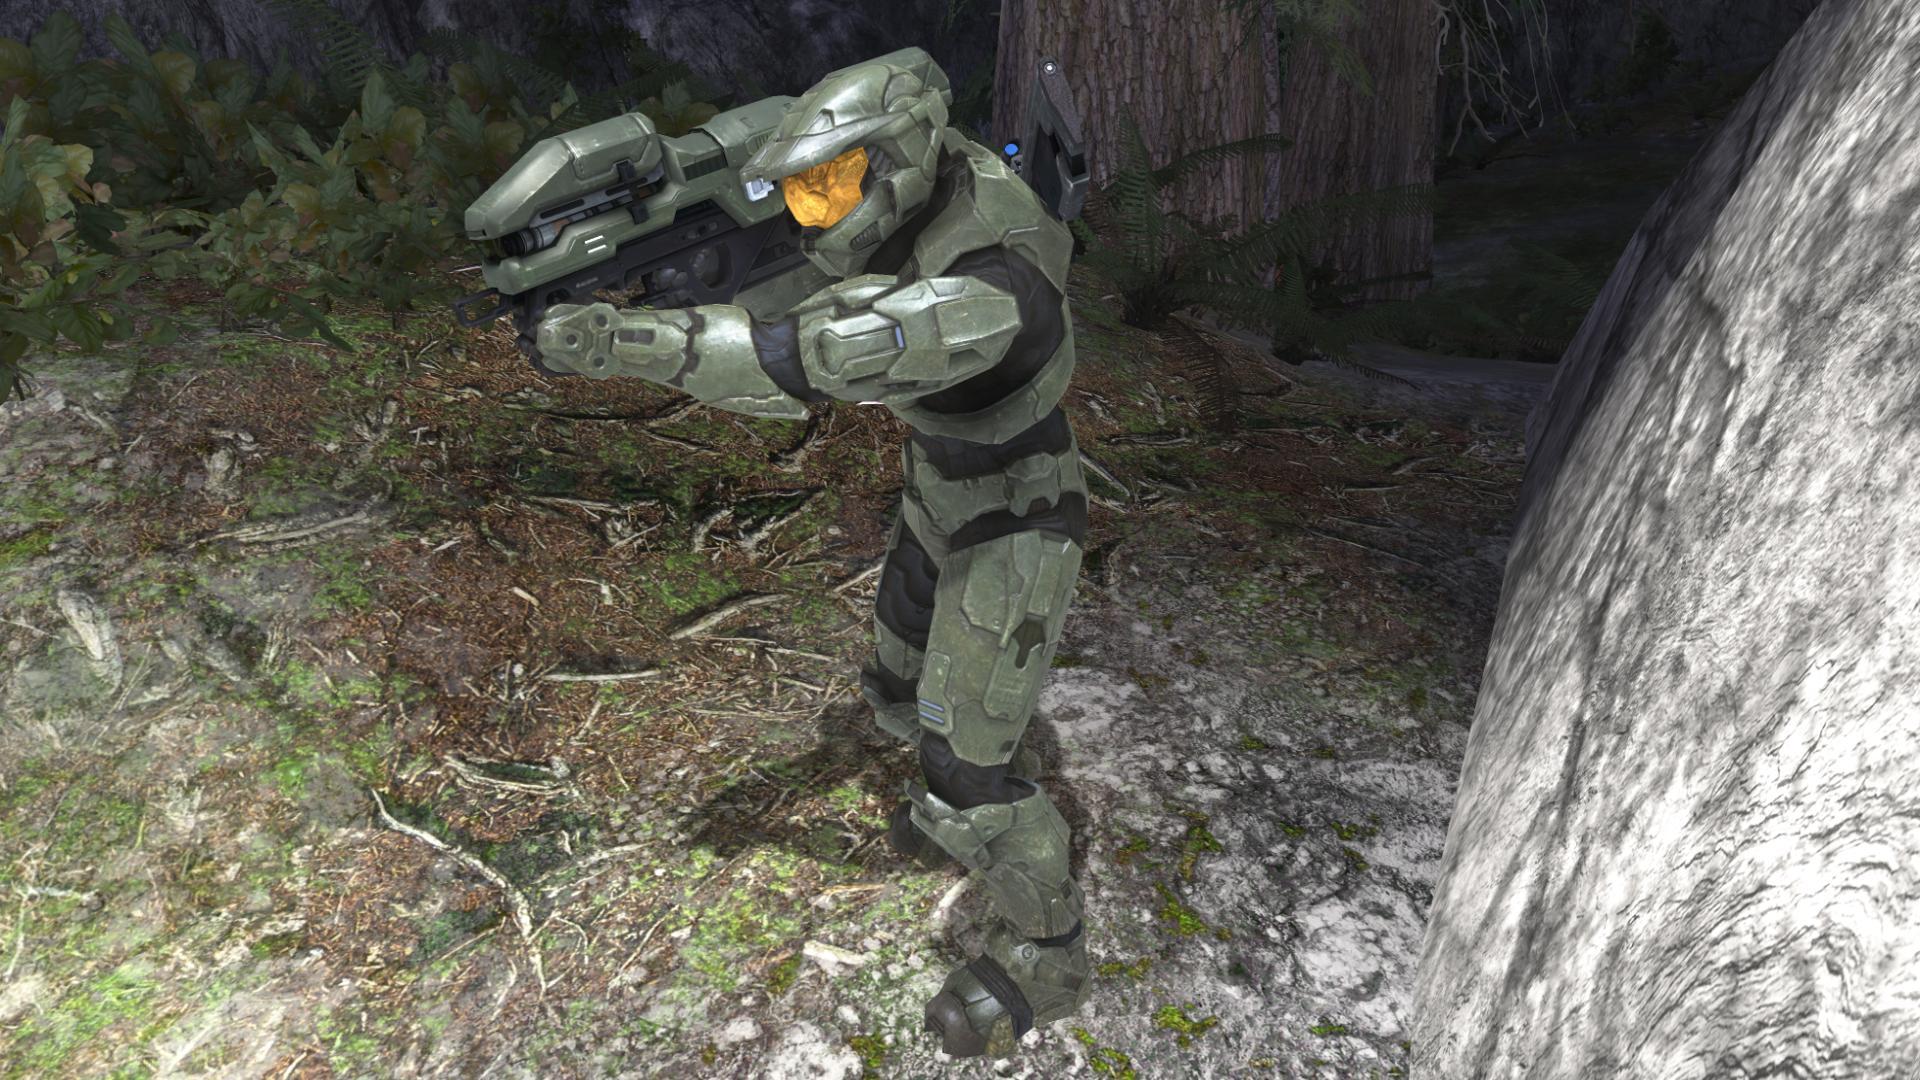 1523550826 eb193ea116 o Halo 3: Guns